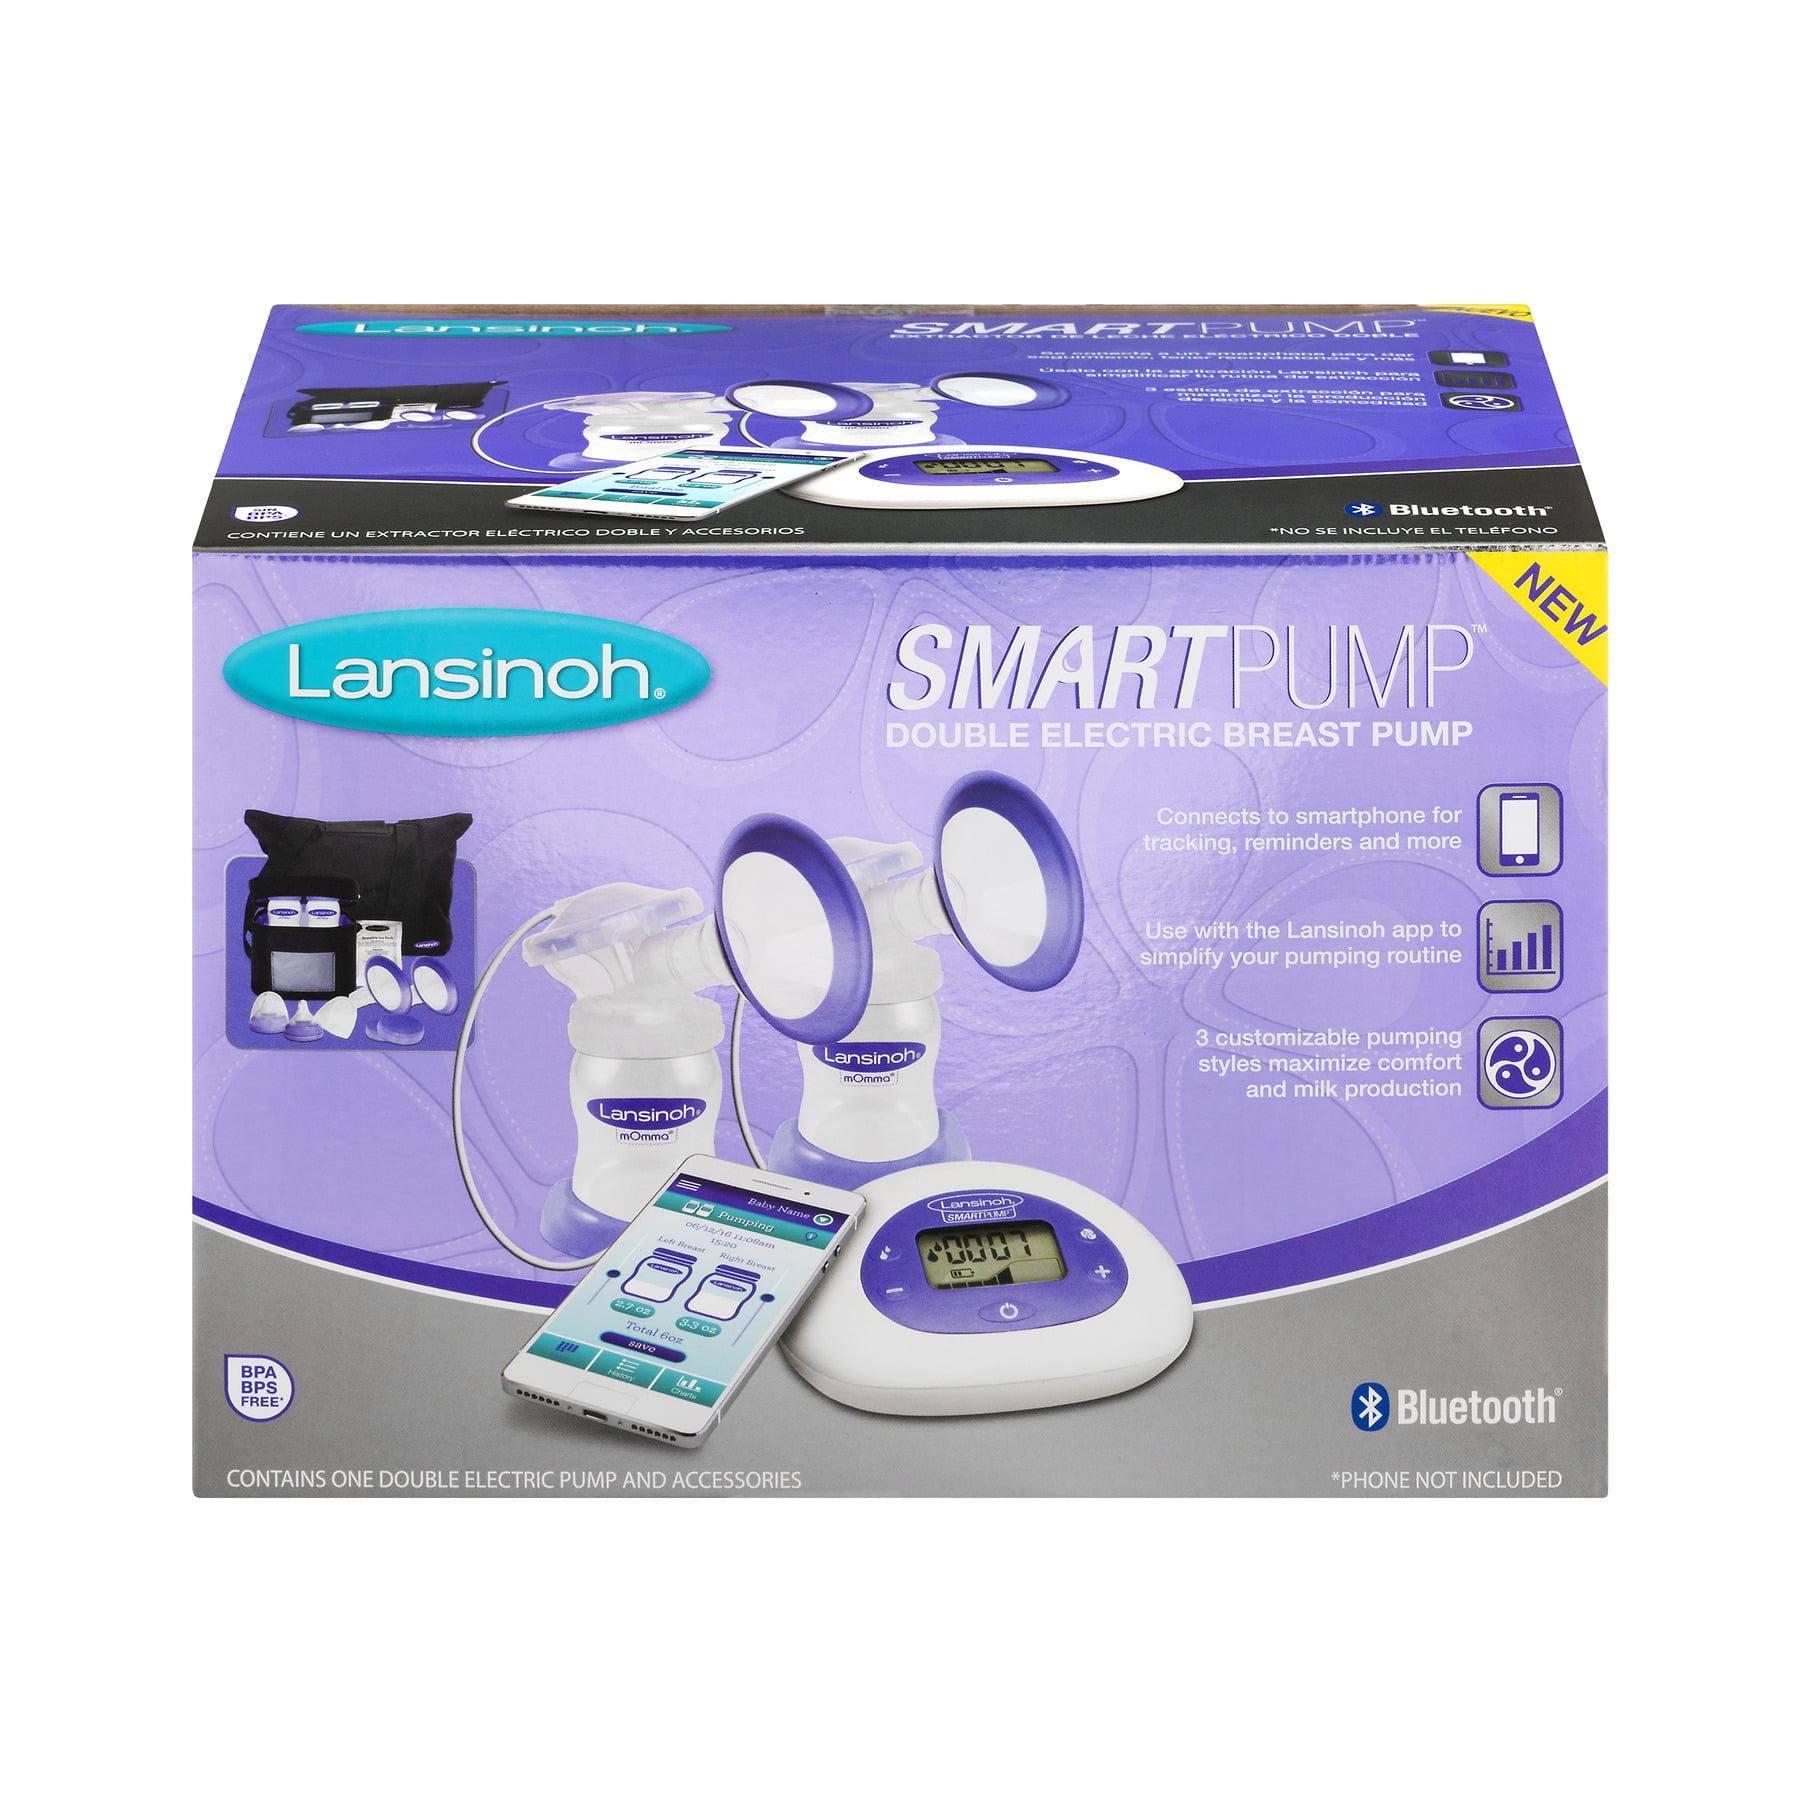 Lansinoh® Smartpump™ Double Electric Breast Pump